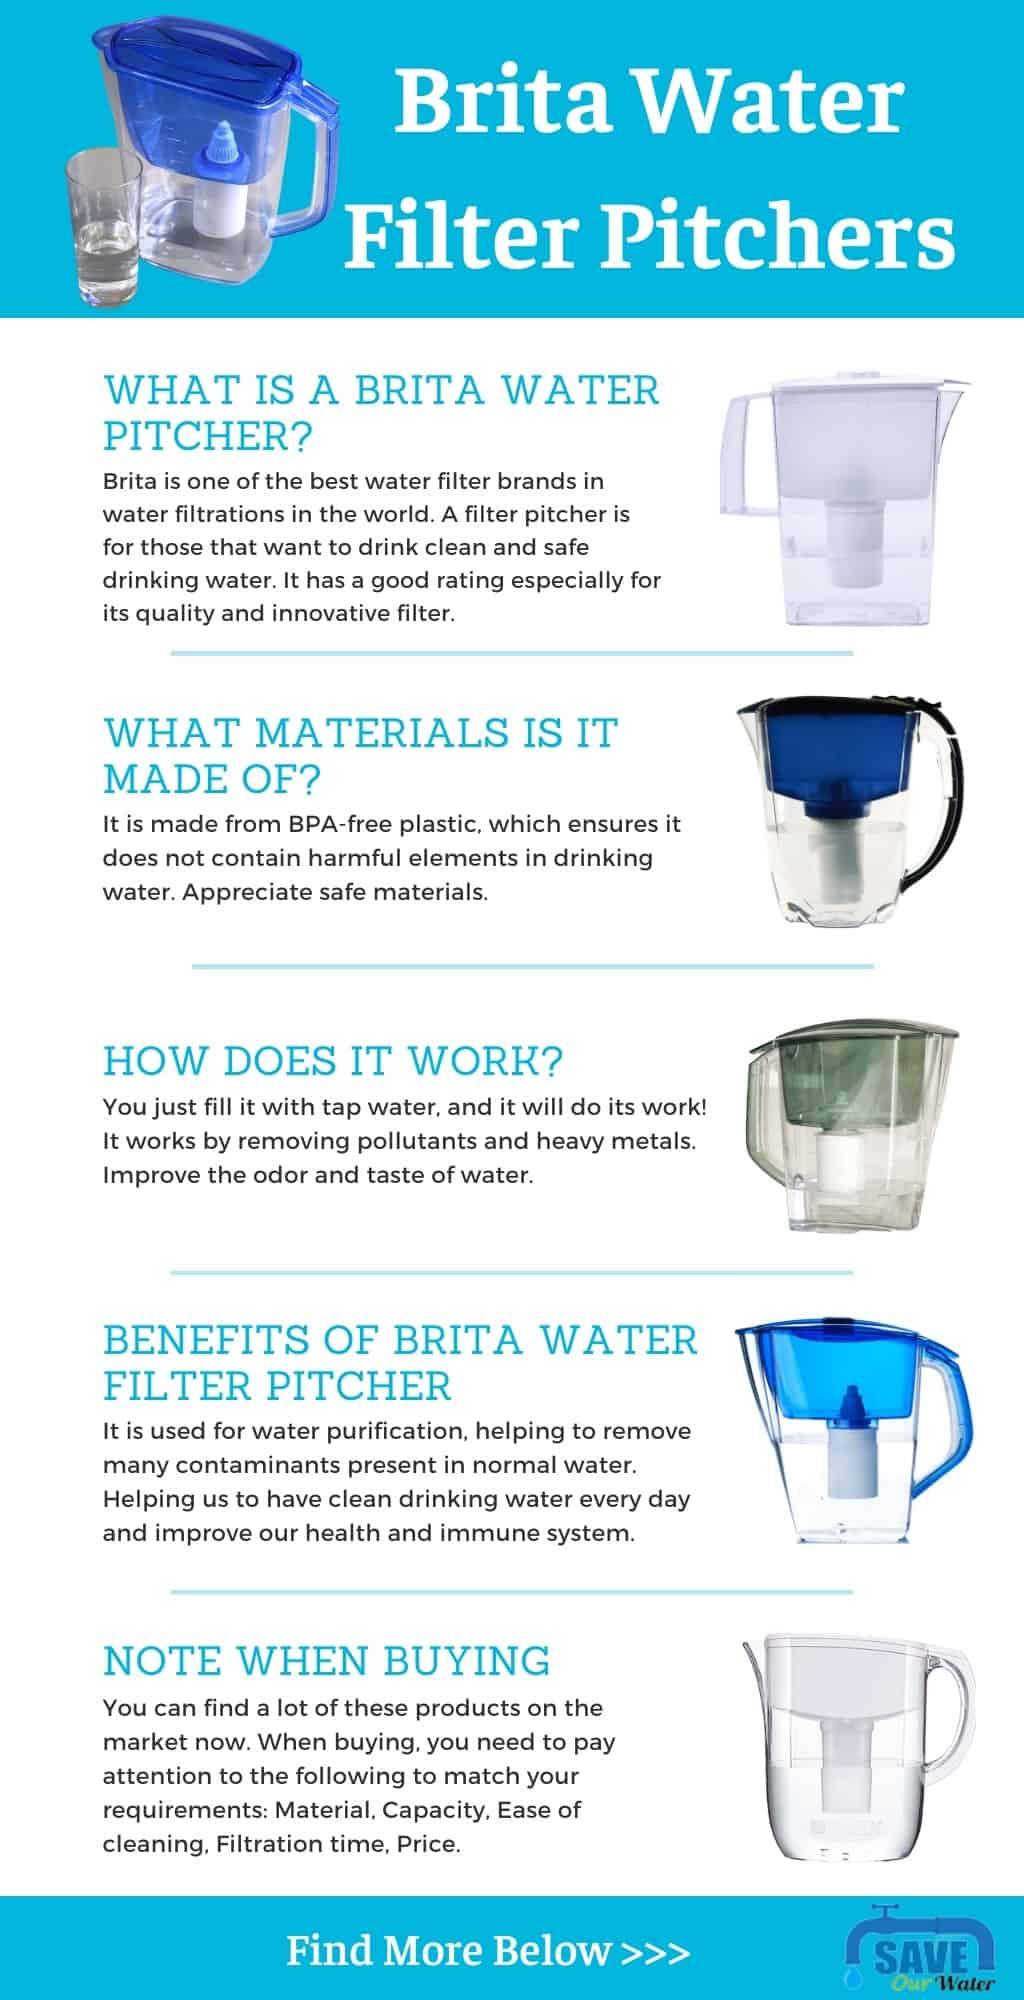 brita-filter-pitcher